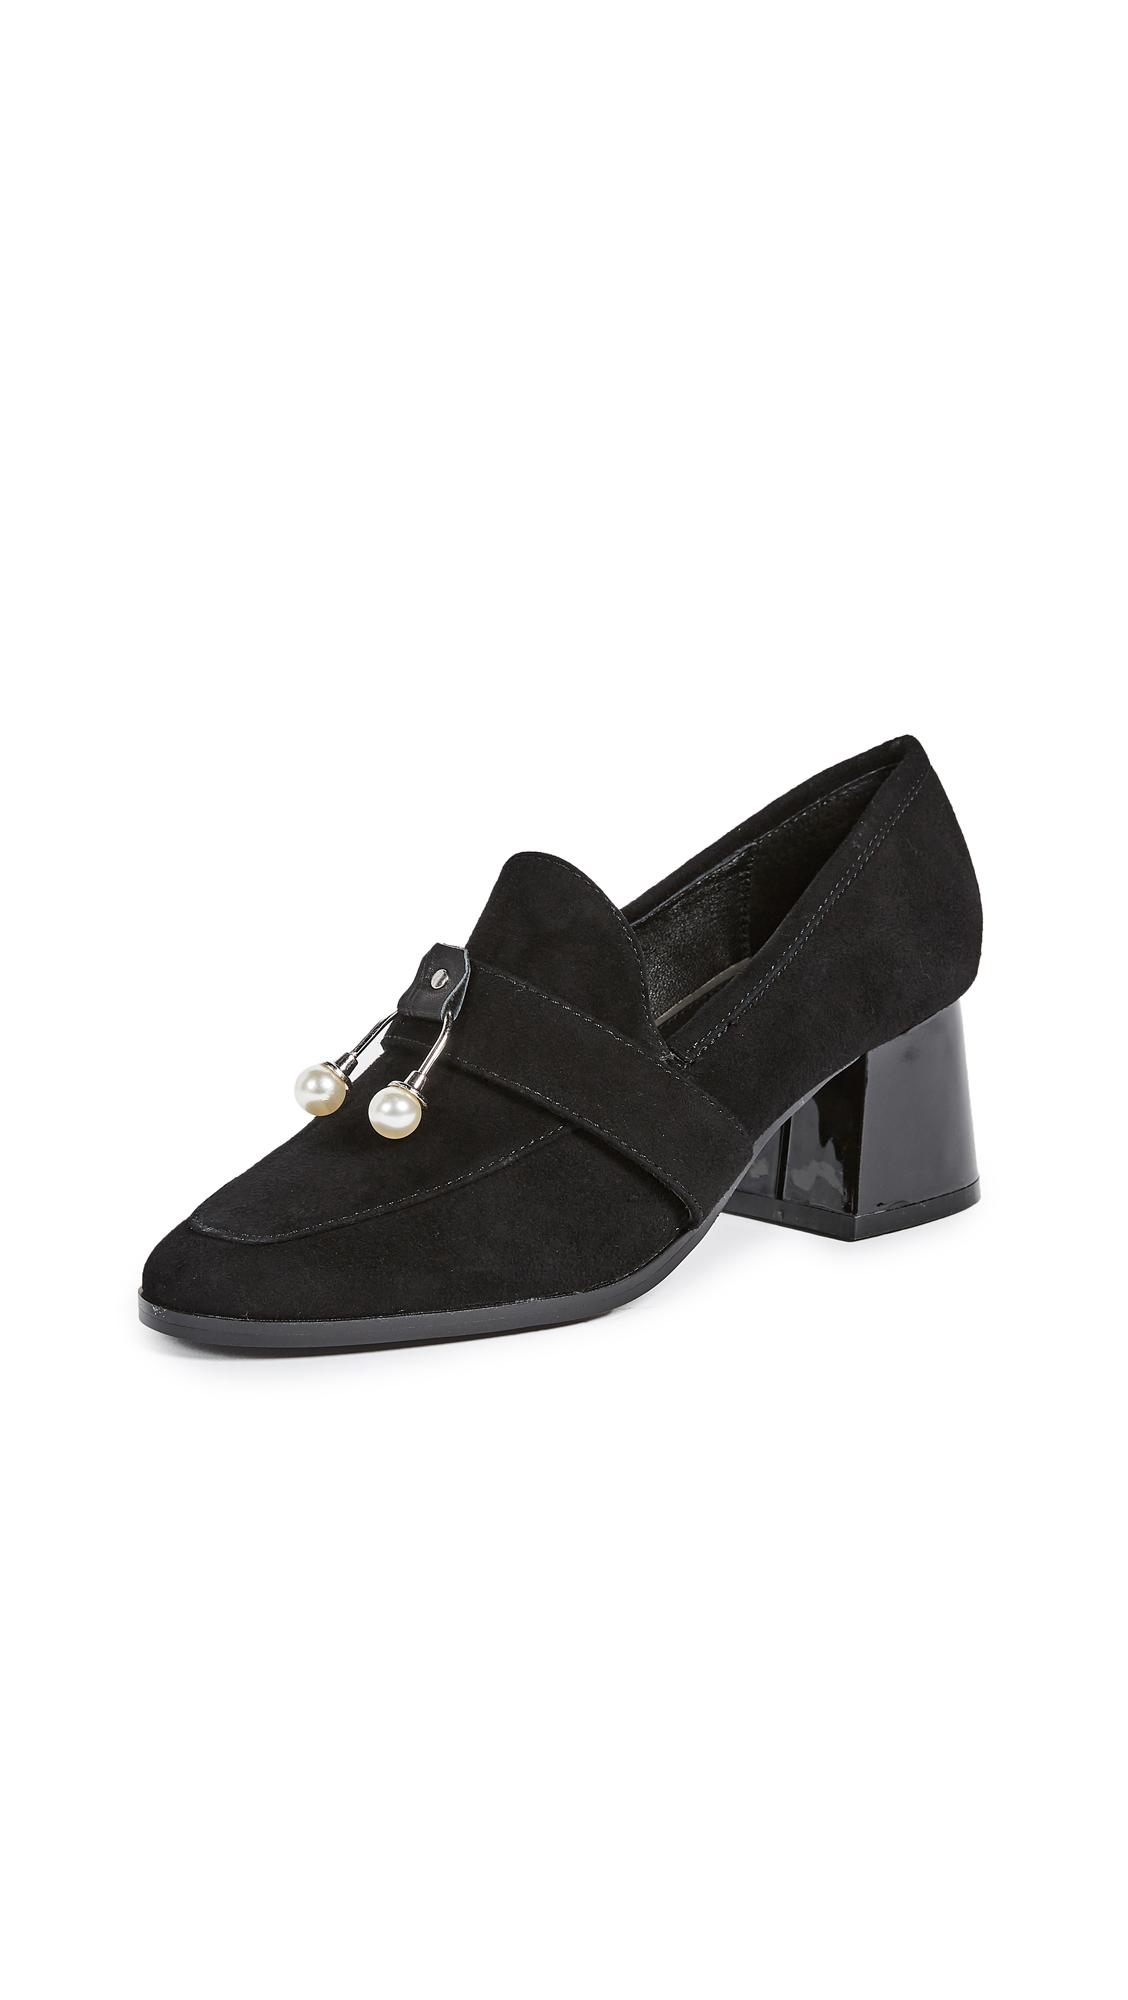 JAGGAR Intermix Block Heel Loafer Pumps - Black